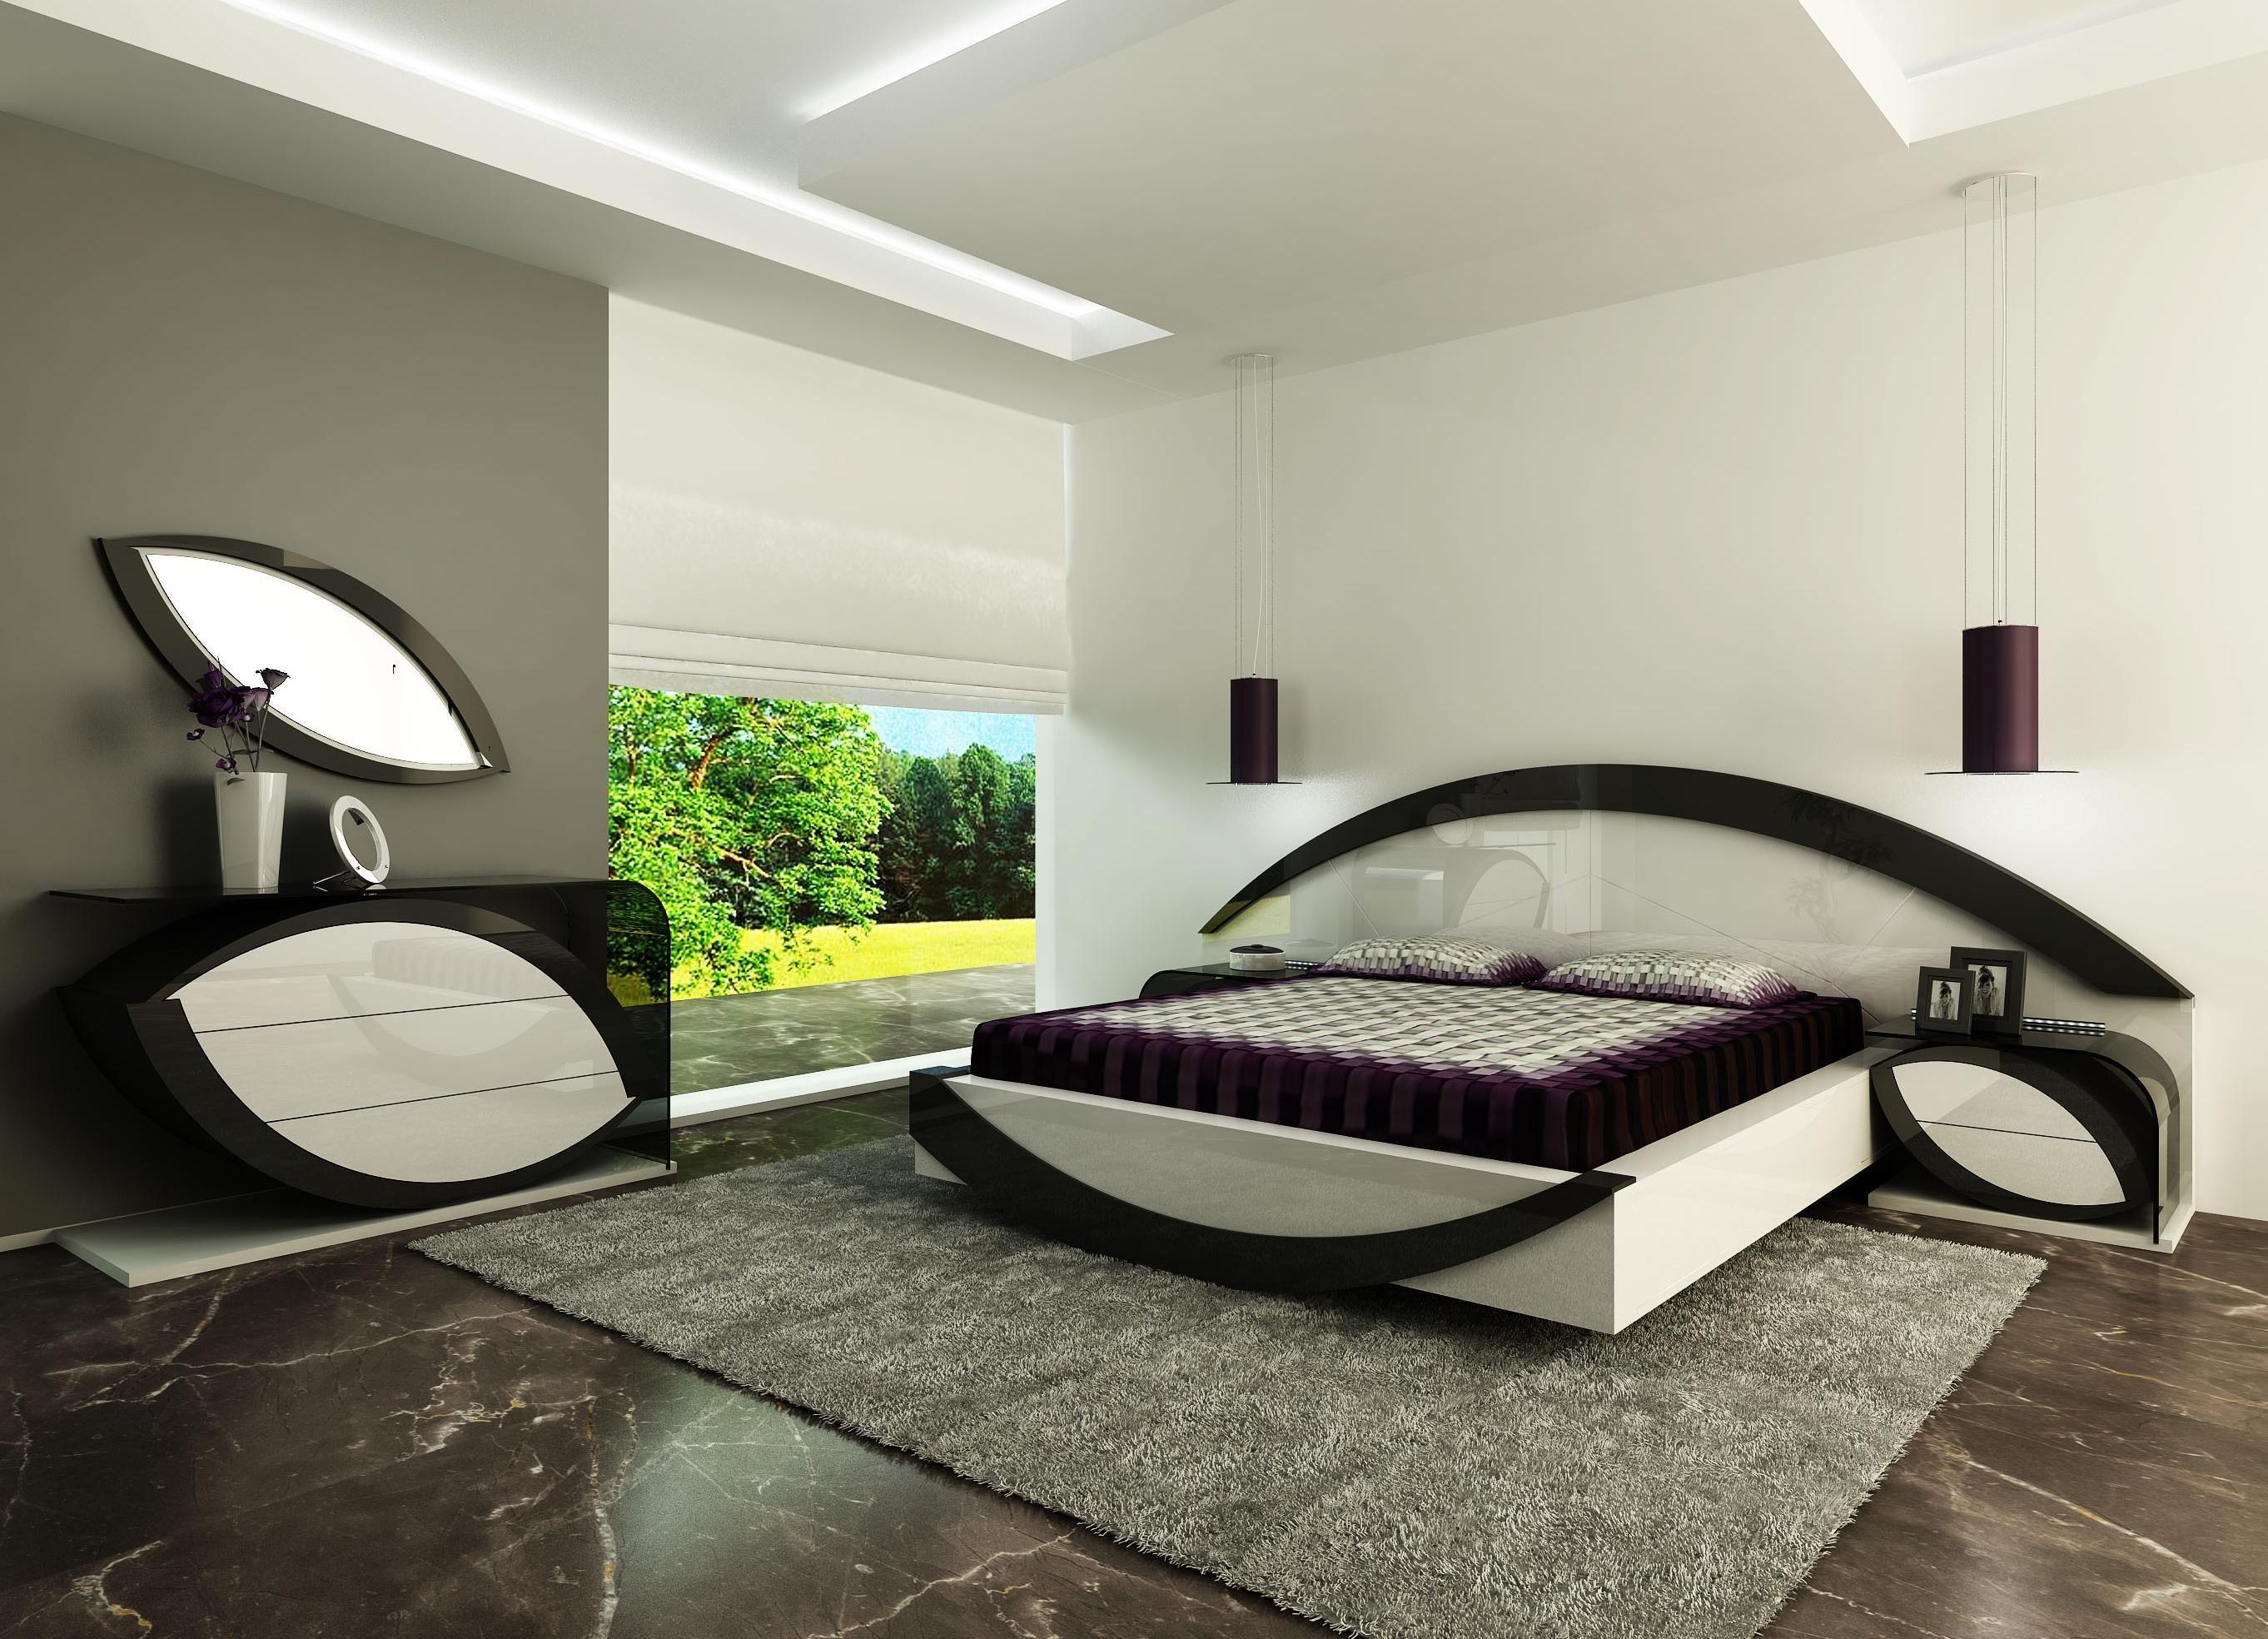 Contemporary Bedroom Furniture Designs Unique Bedroom Furniture Modern Bedroom Furniture Sets Bedroom Furniture Design